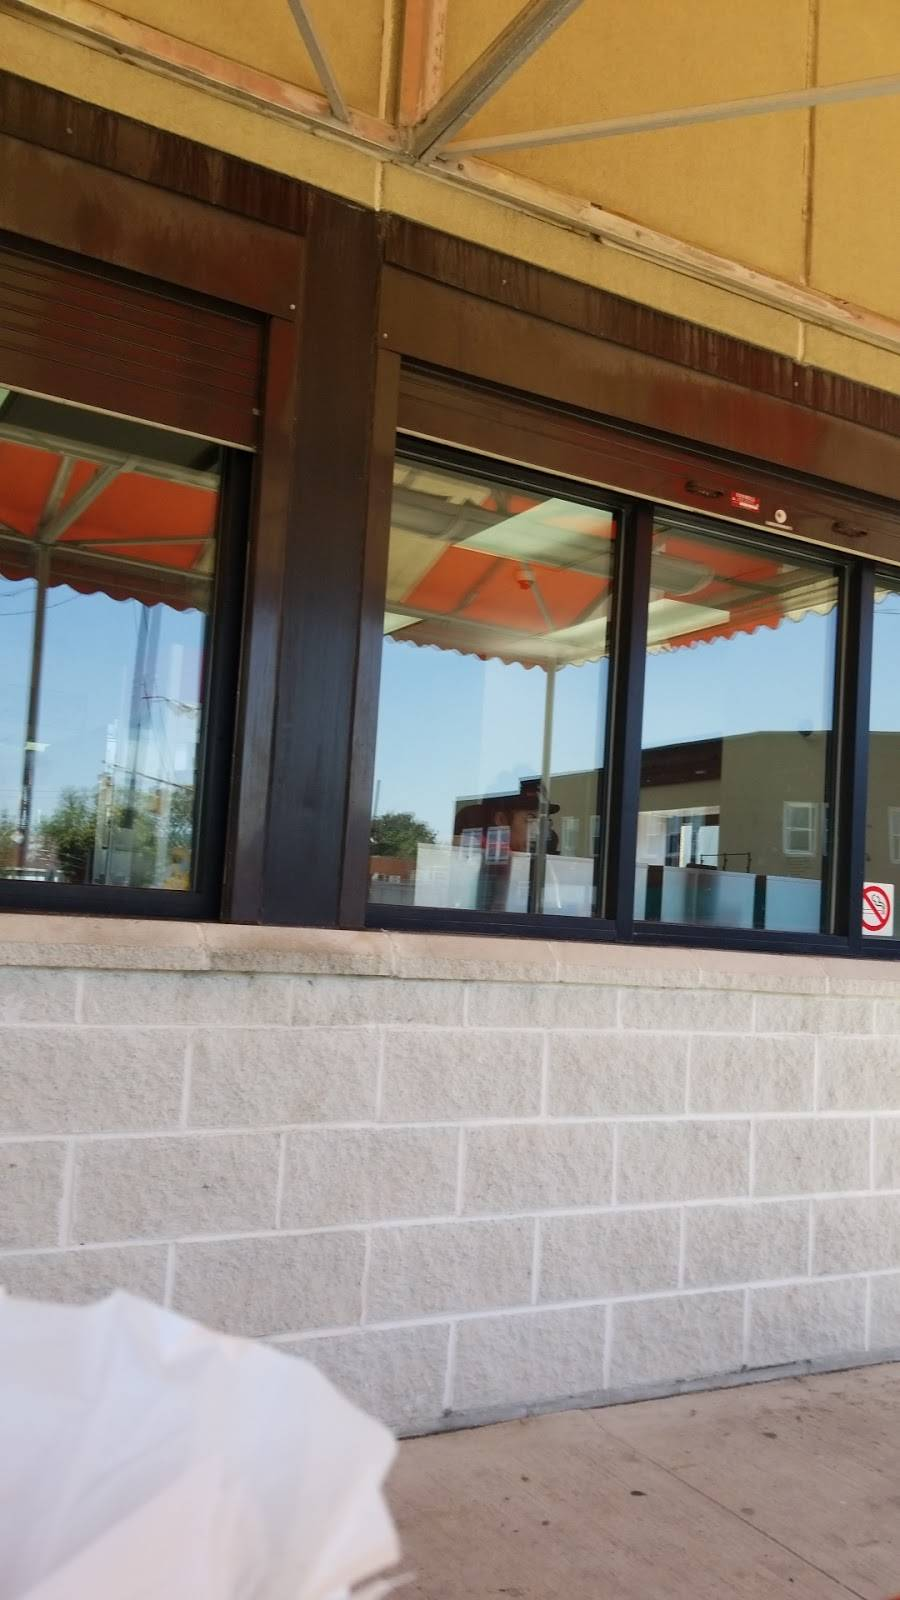 Nettys - restaurant  | Photo 9 of 9 | Address: 325 S Fearing Blvd, Toledo, OH 43609, USA | Phone: (419) 214-0774